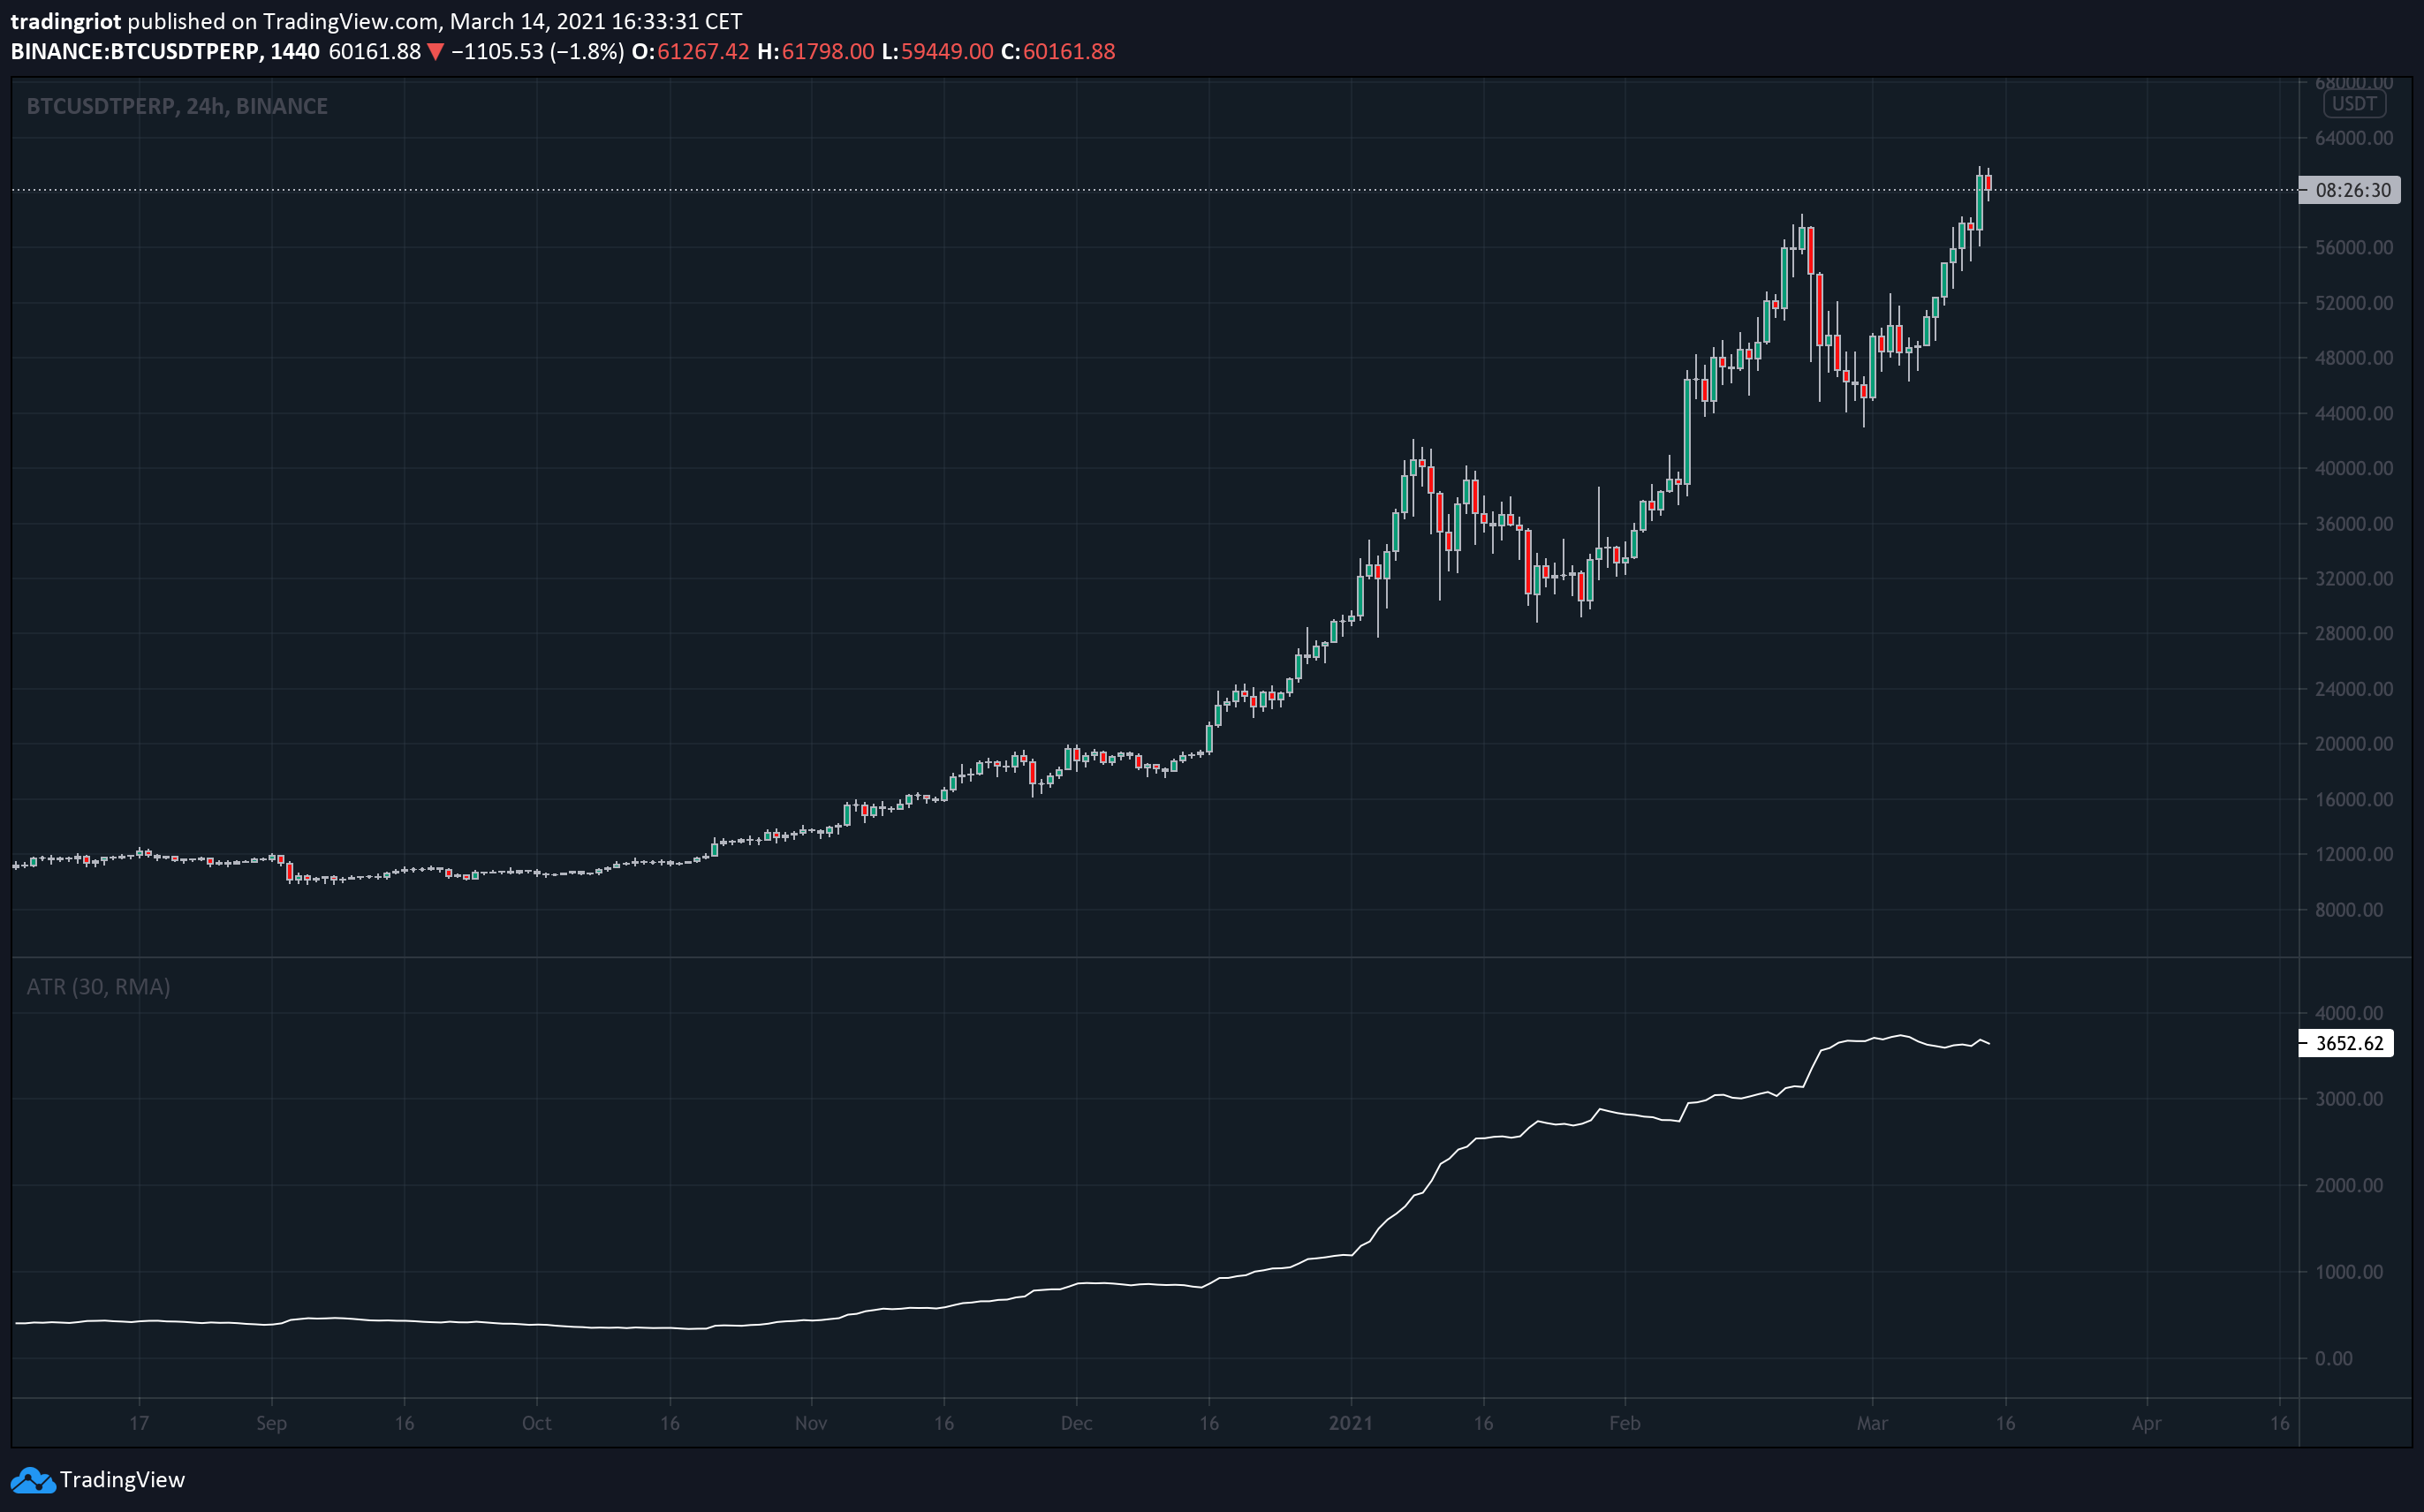 bitcoin average true range